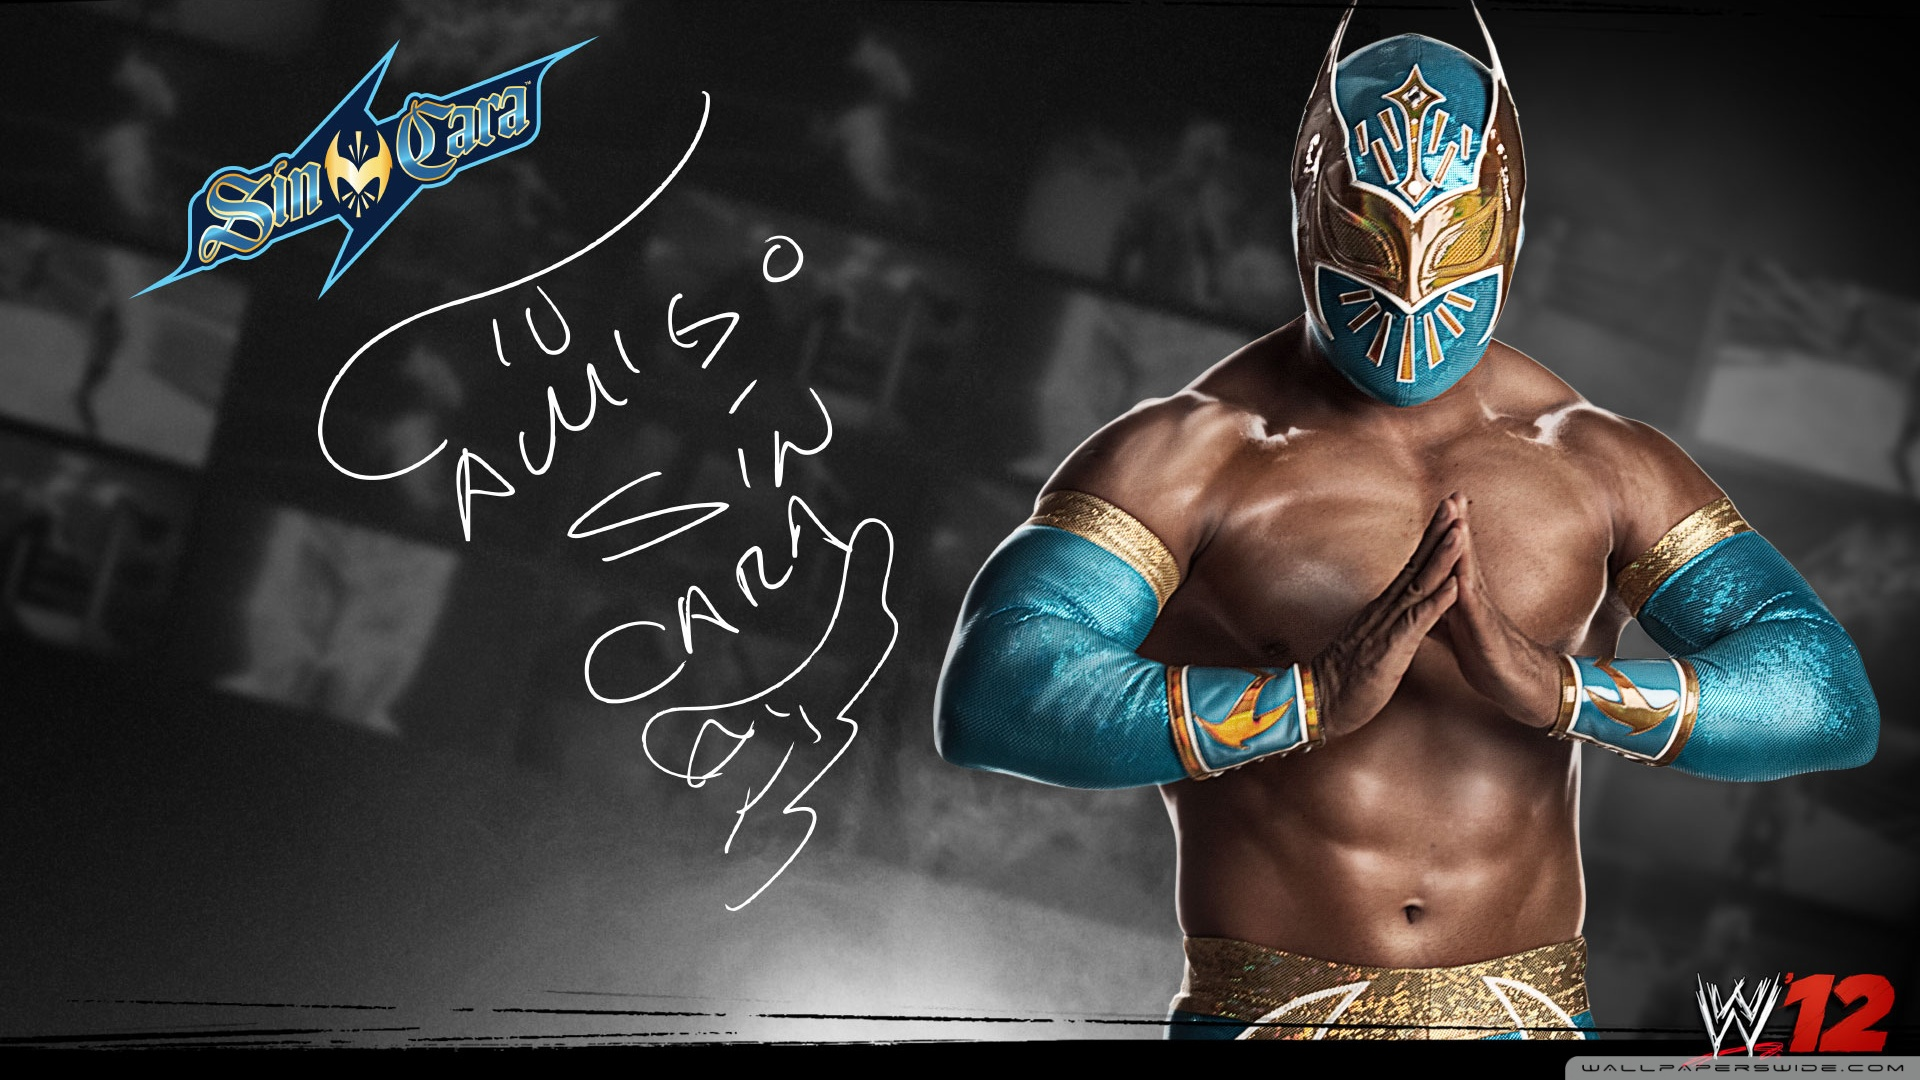 Sin Cara WWE 12 Signature Poster 1920x1080 HD Wallpaper Sport 1920x1080